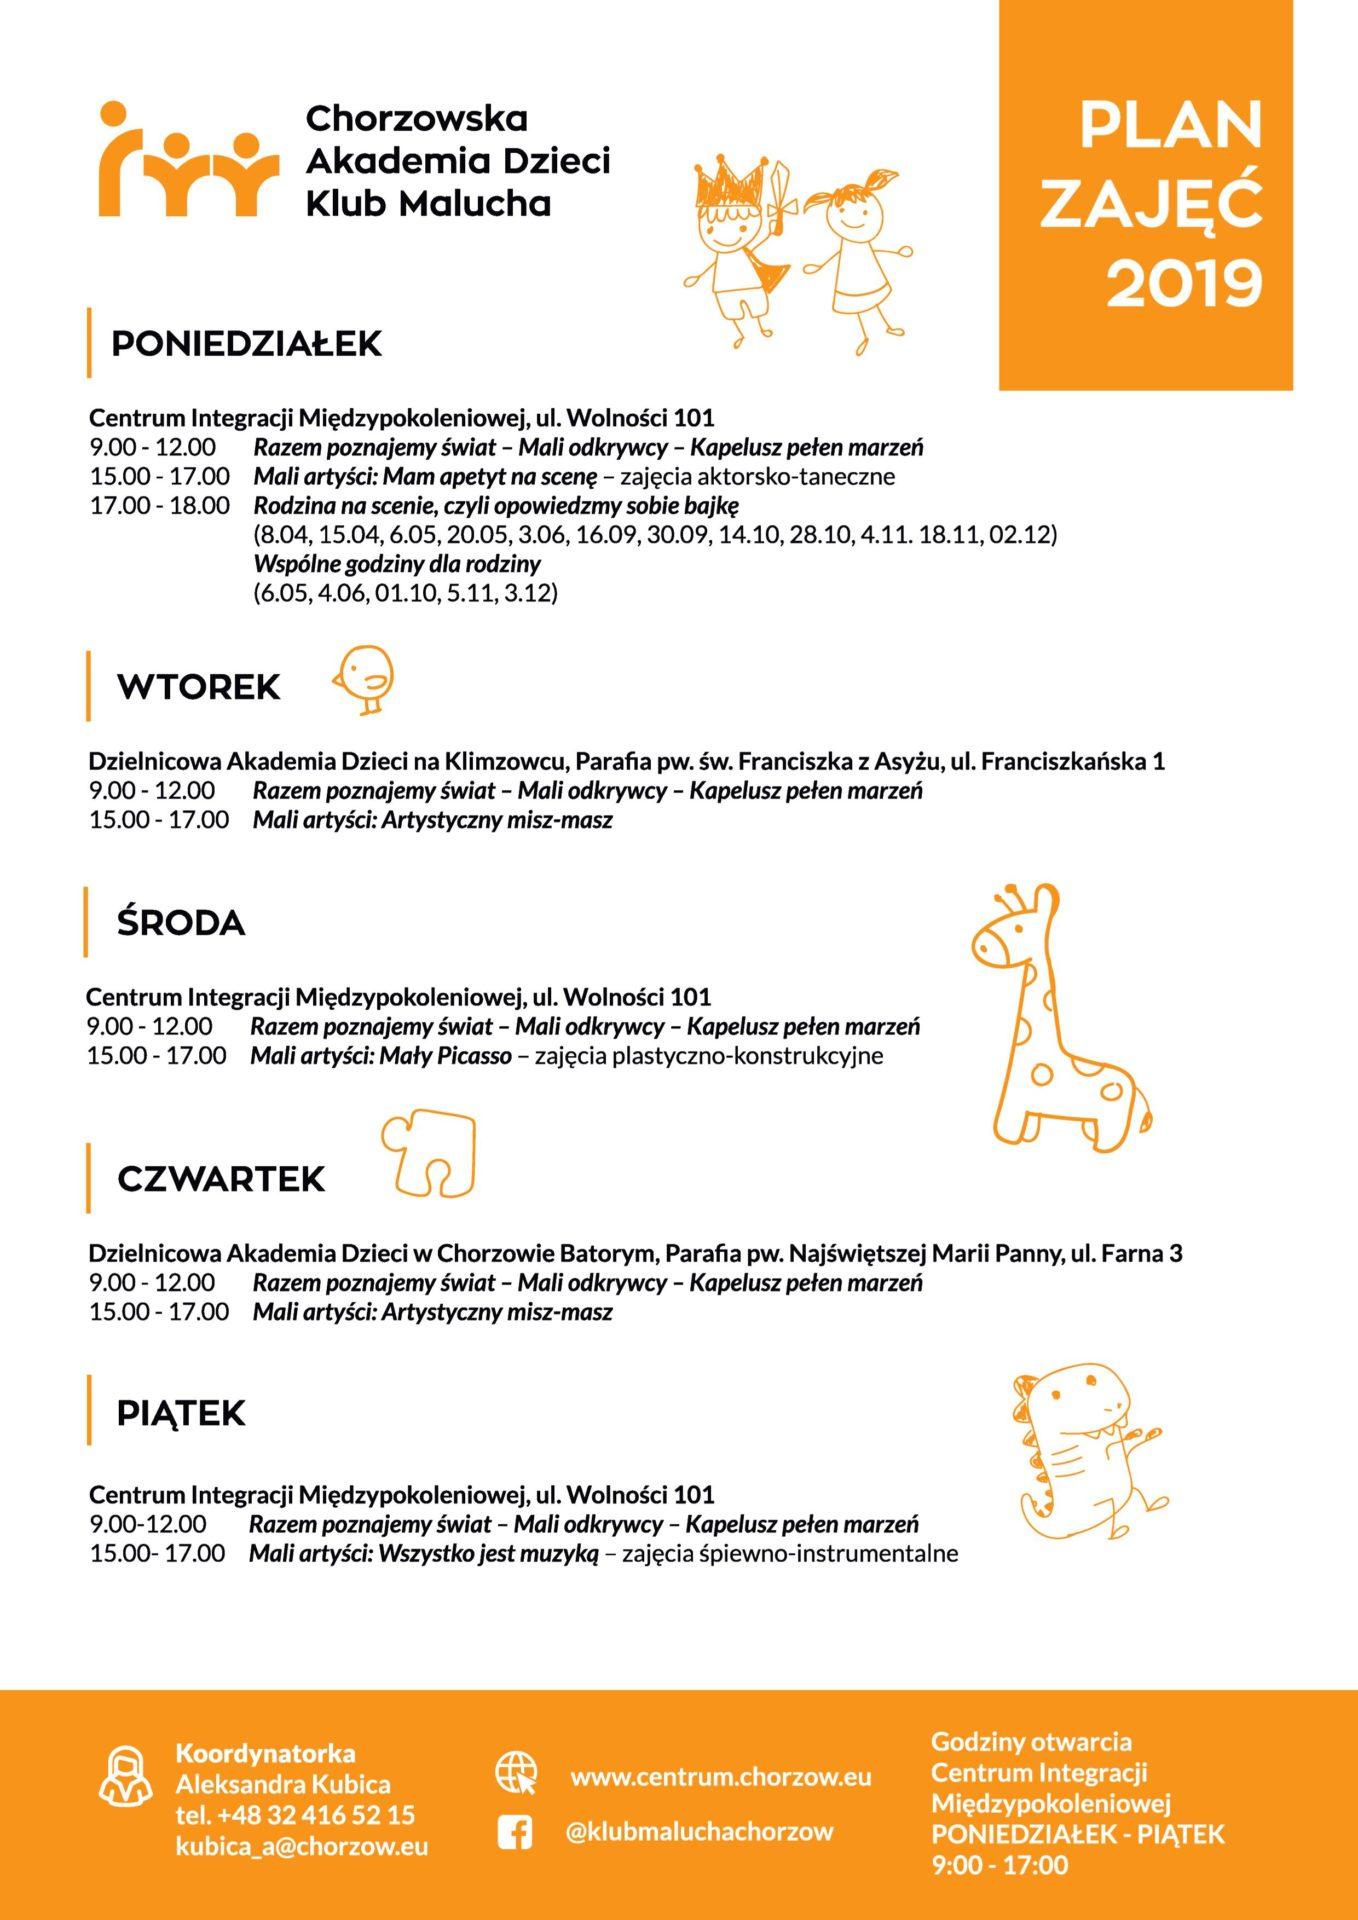 Chorzowska Akademia Dzieci Klub Malucha